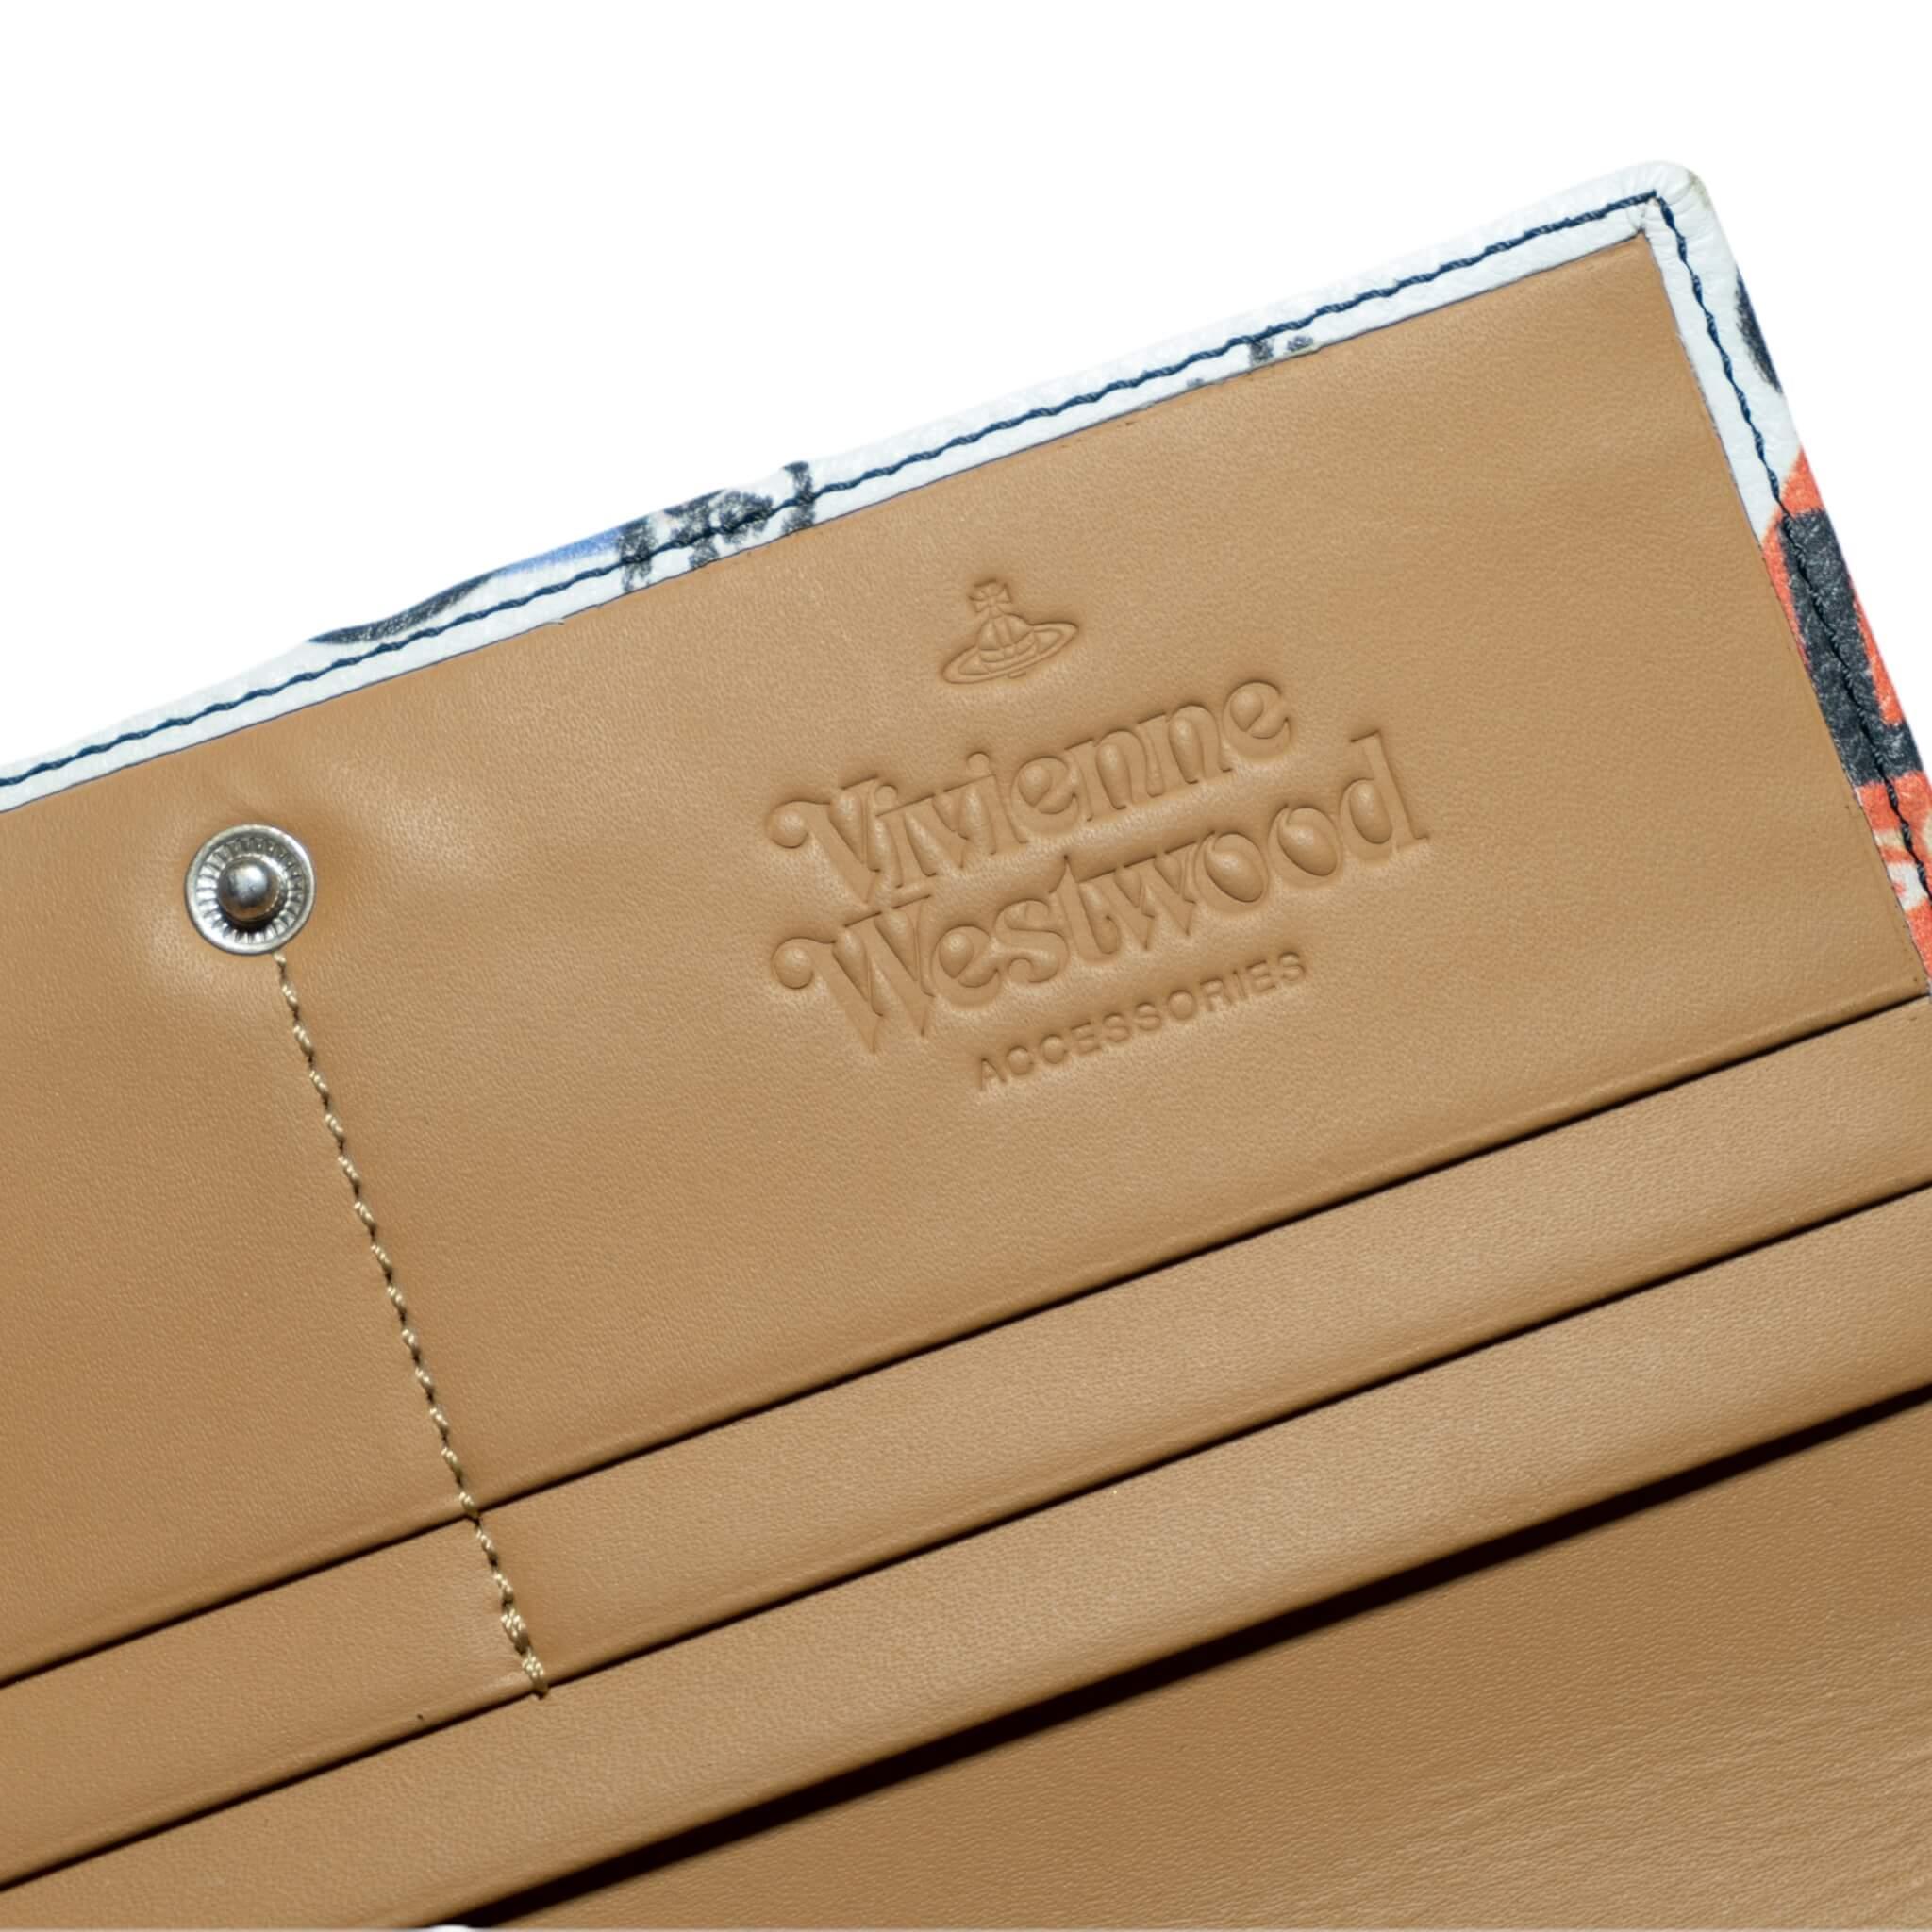 Vivienne Westwood Colorful Cowboy Wallet